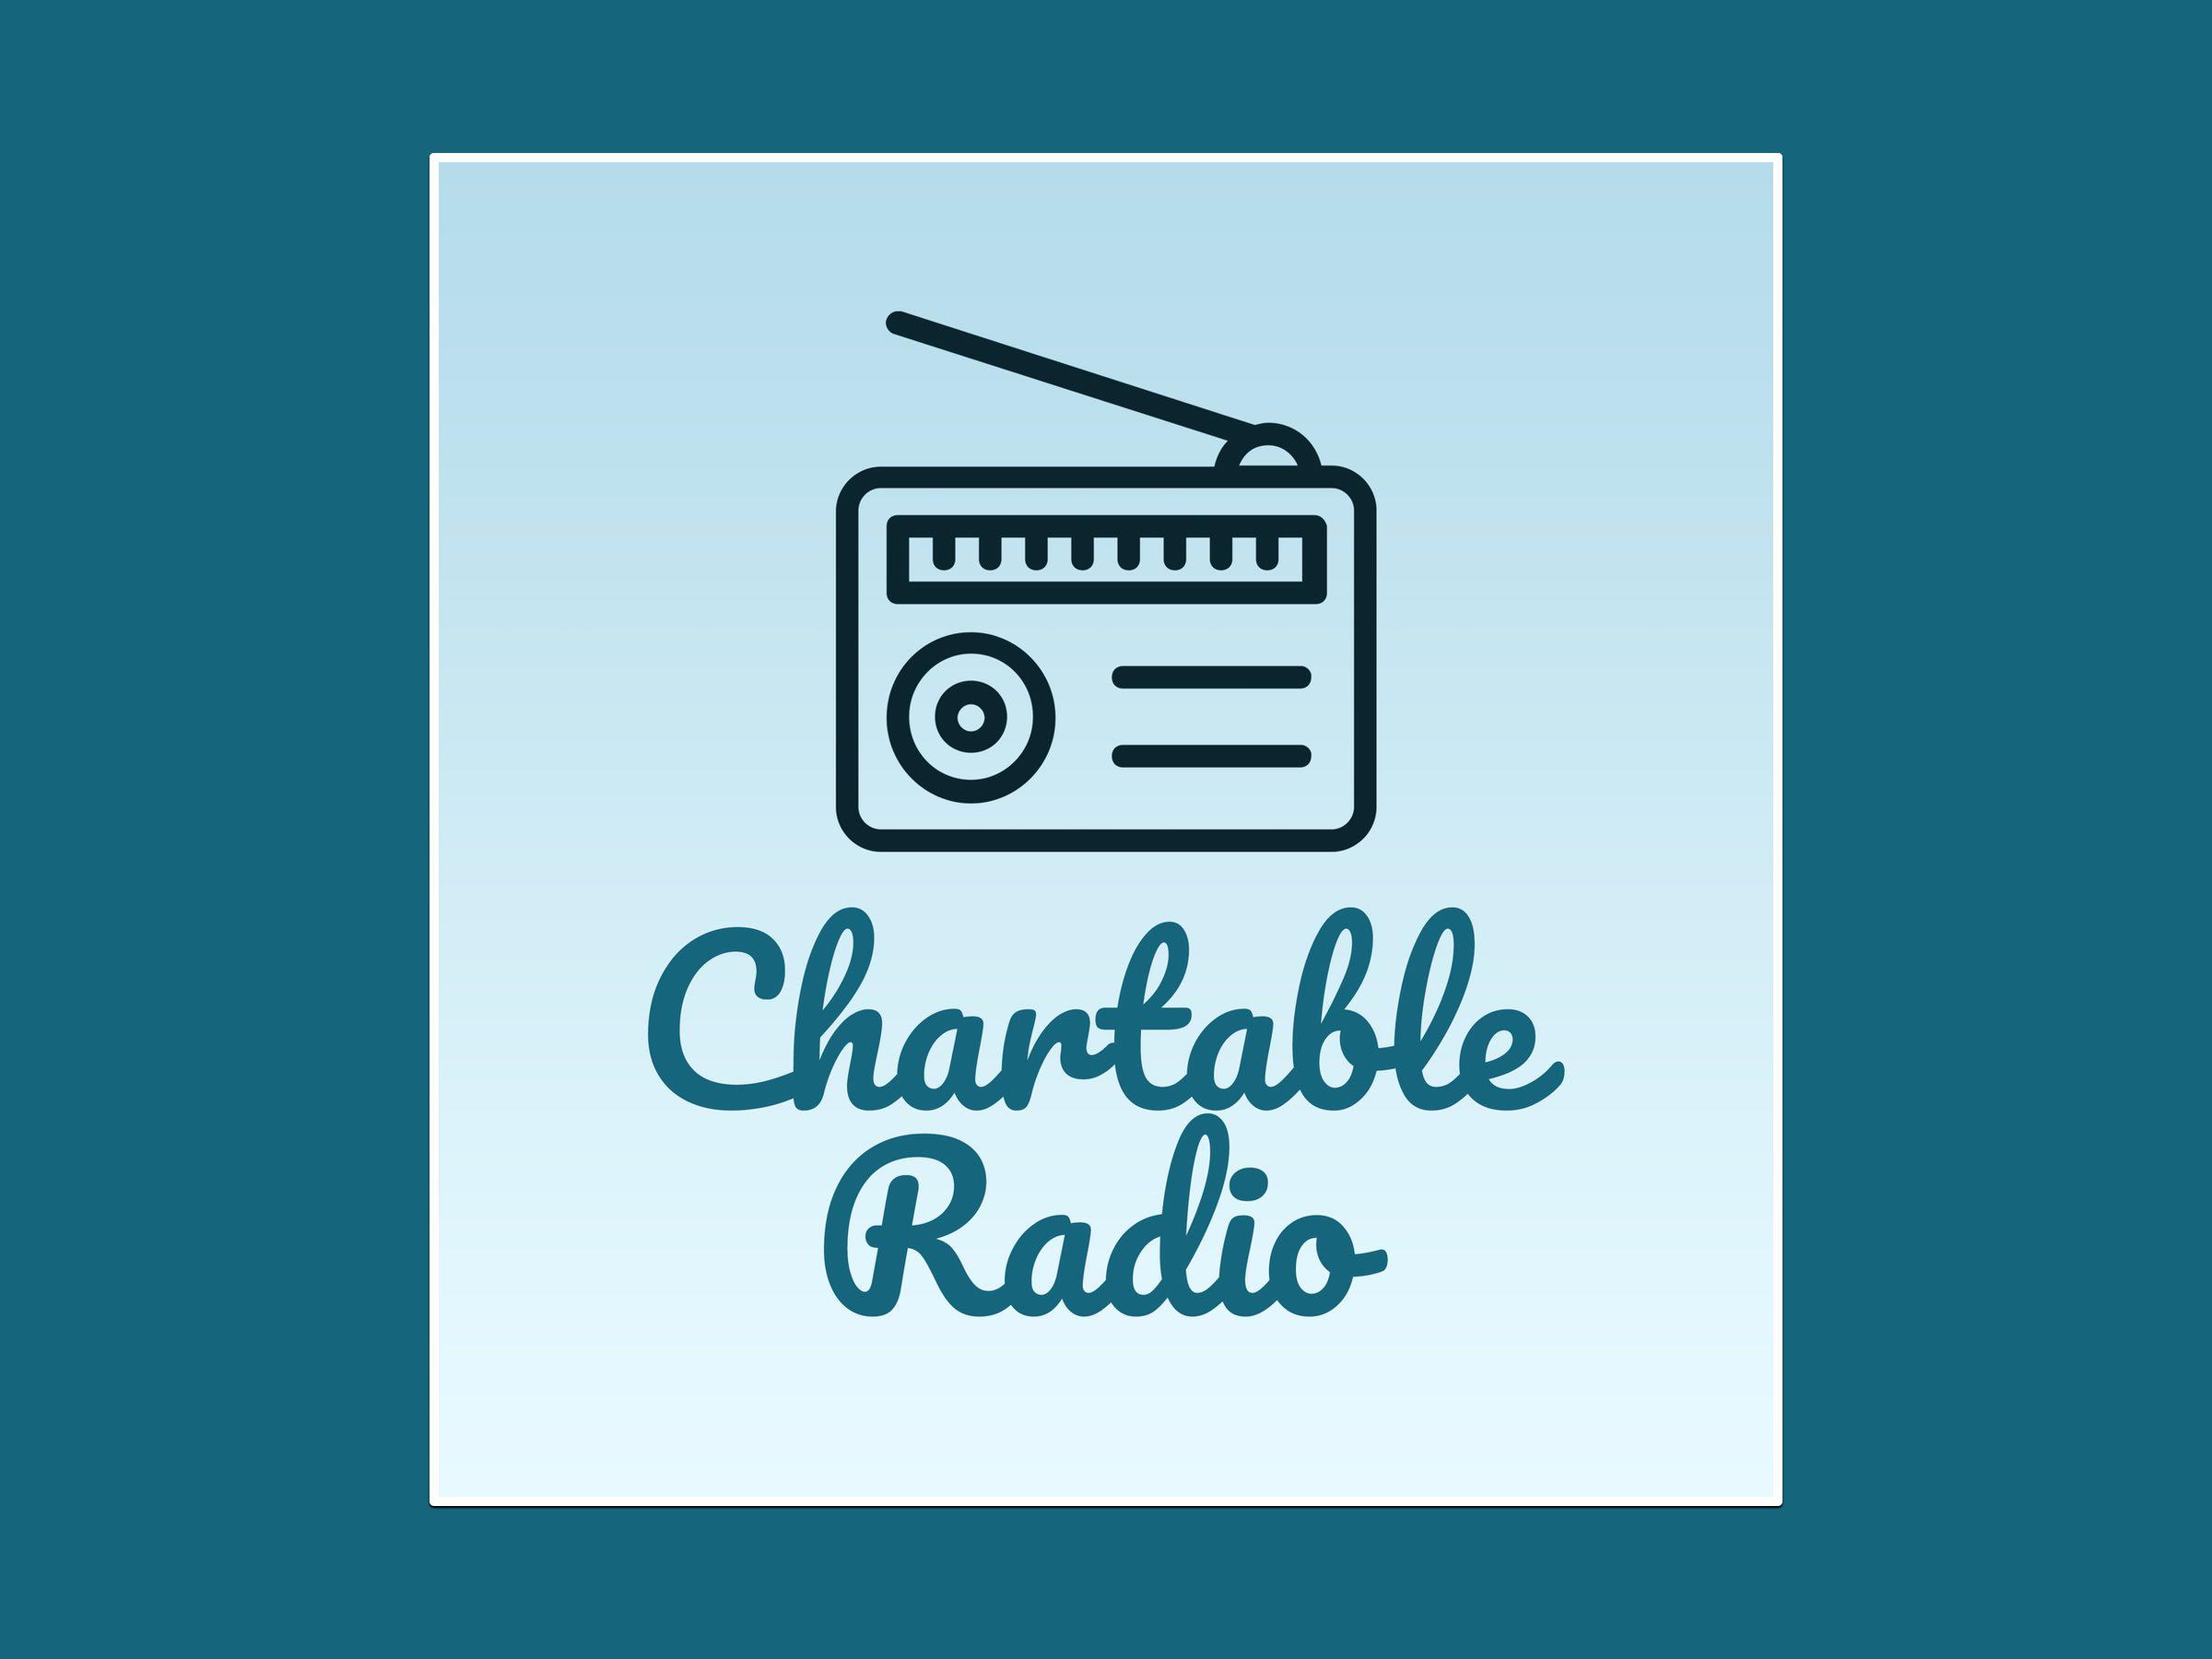 Chartable Radio